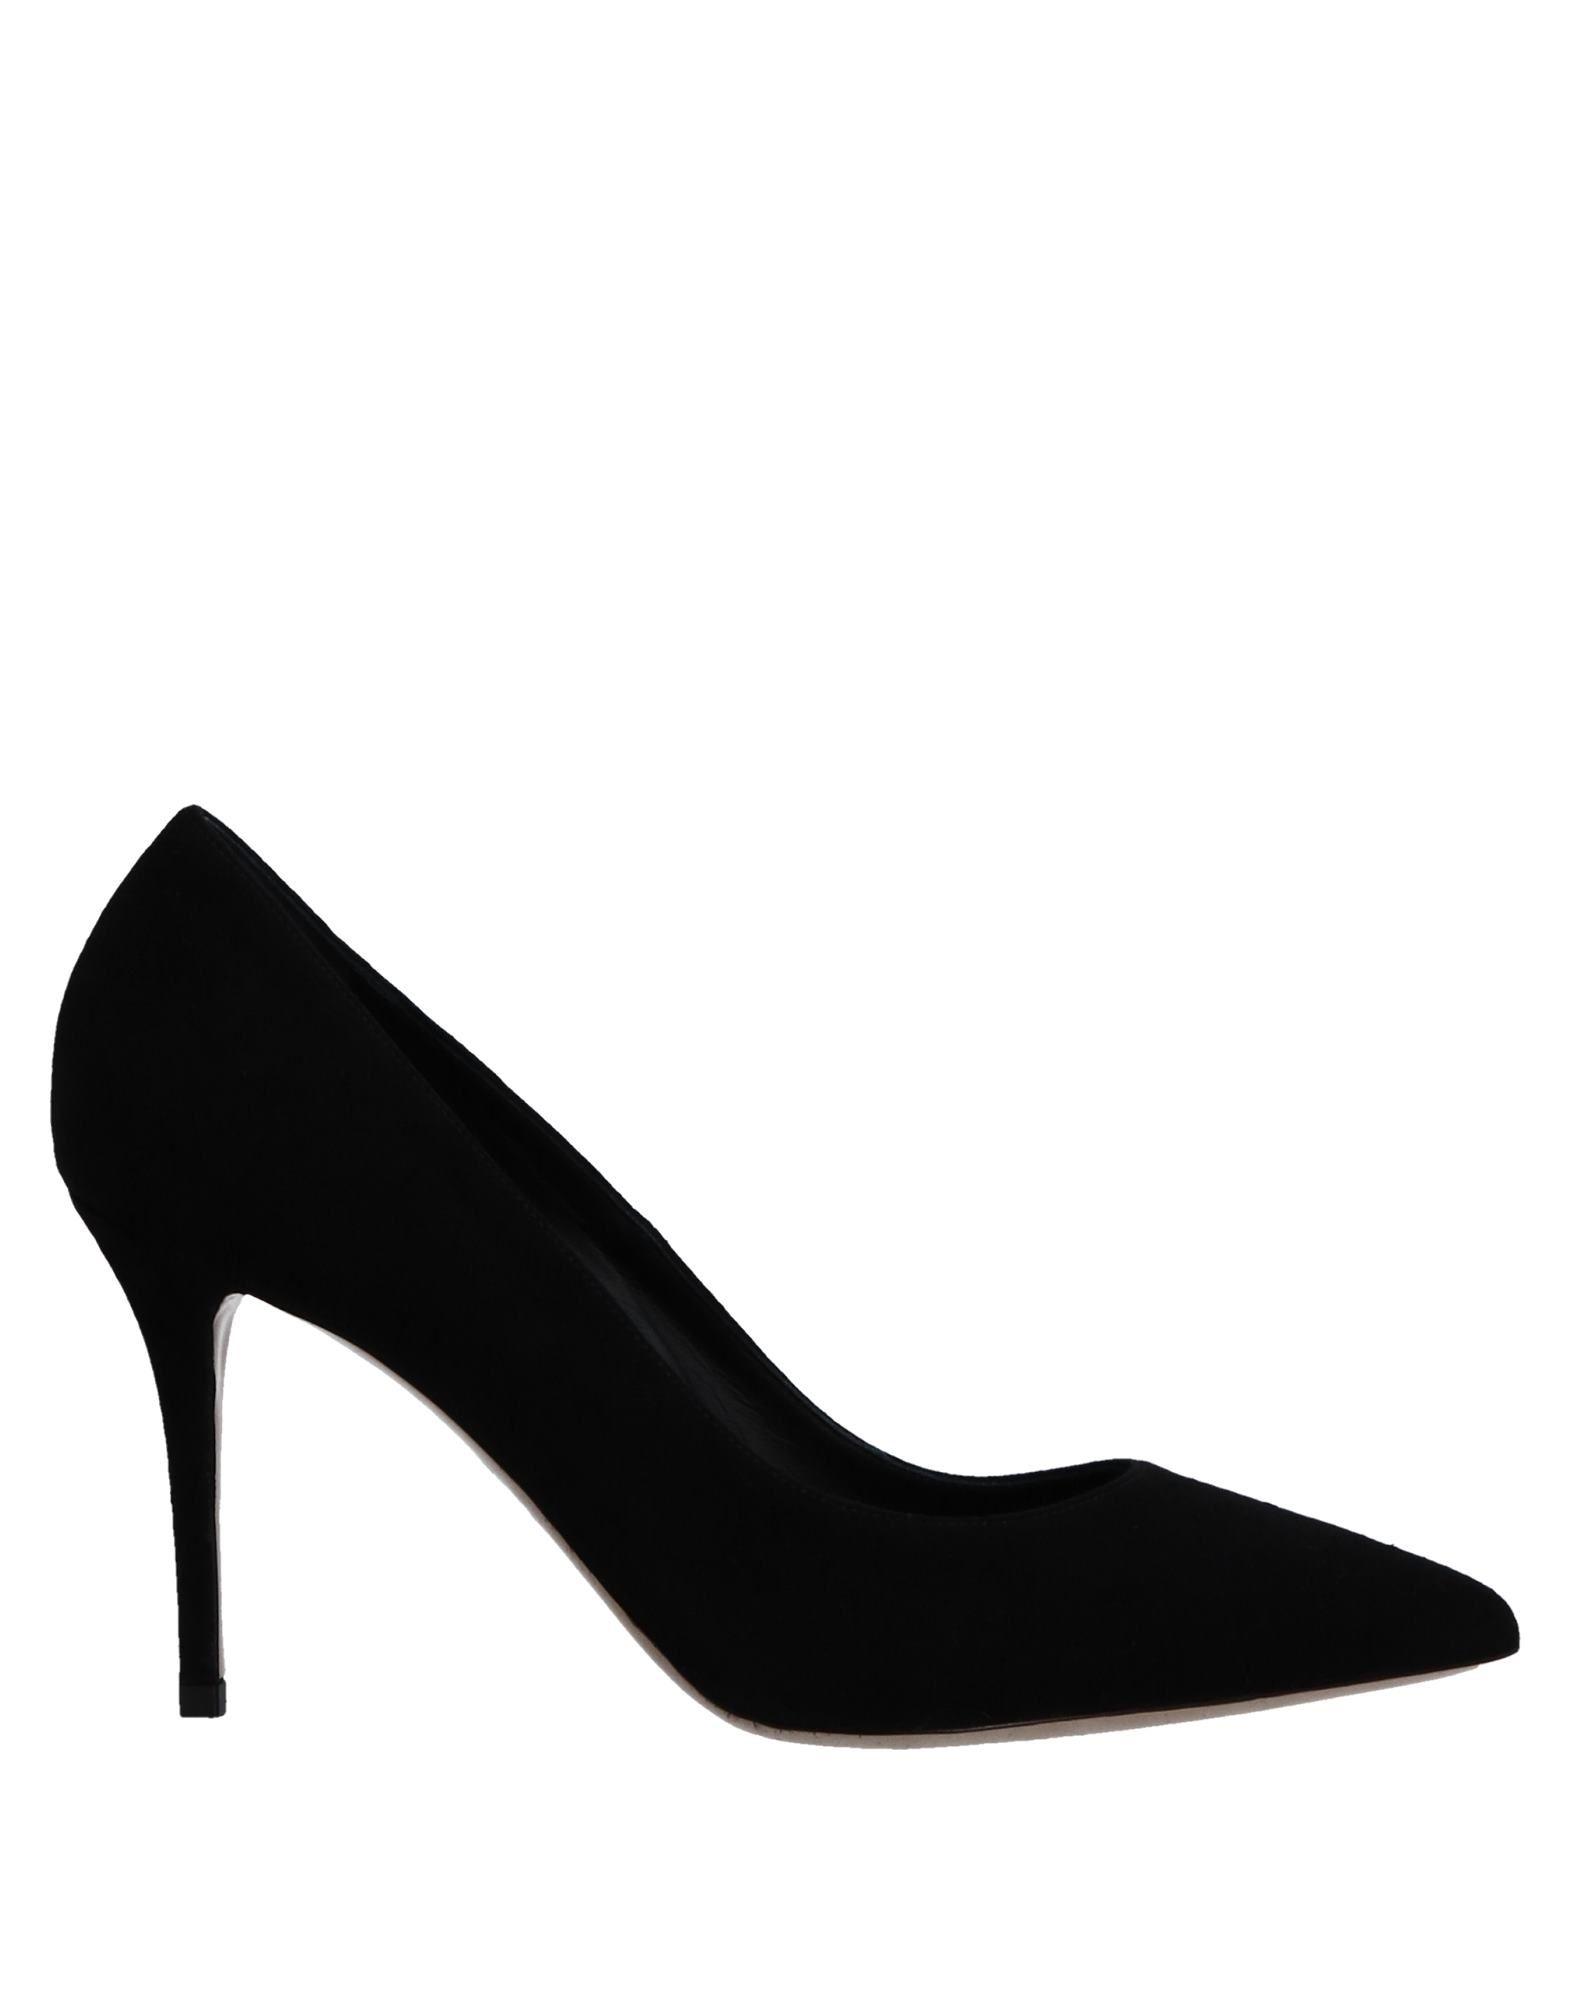 Le Silla Pumps Damen  11526898SLGut aussehende strapazierfähige Schuhe